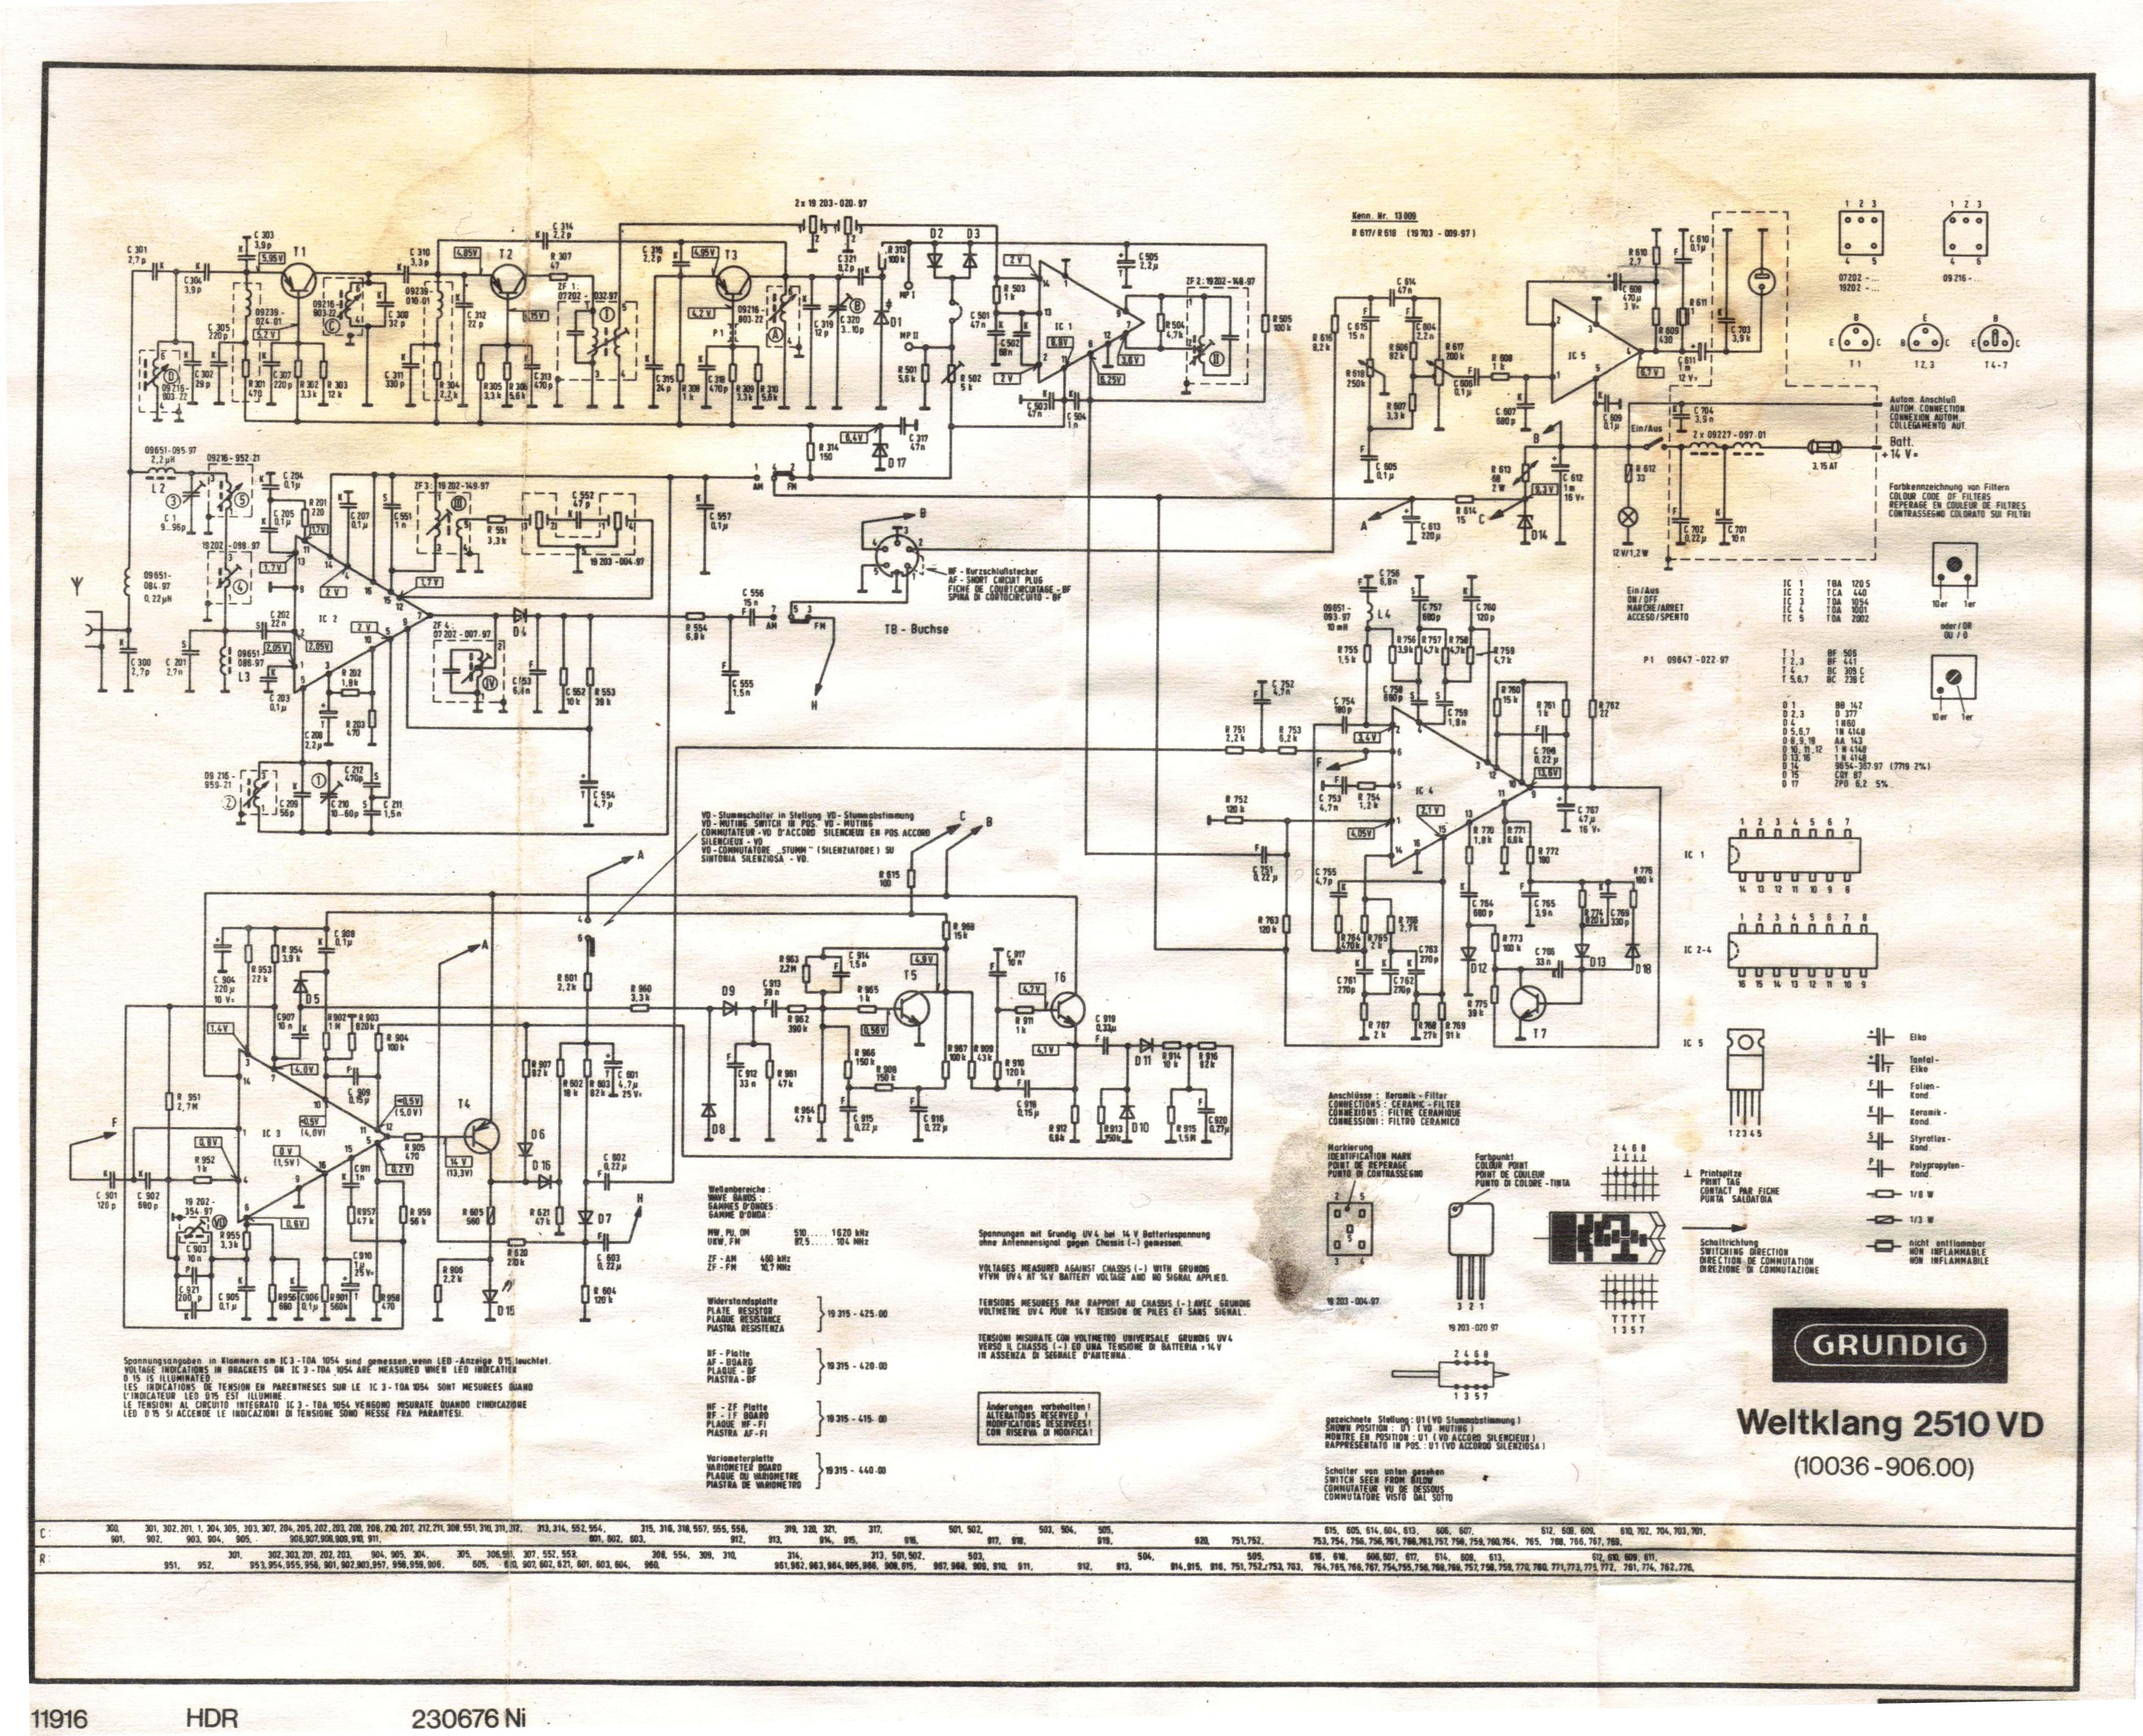 Thesamba Com    Grundig Weltklang 2510 Vd Vw Radio Schematic